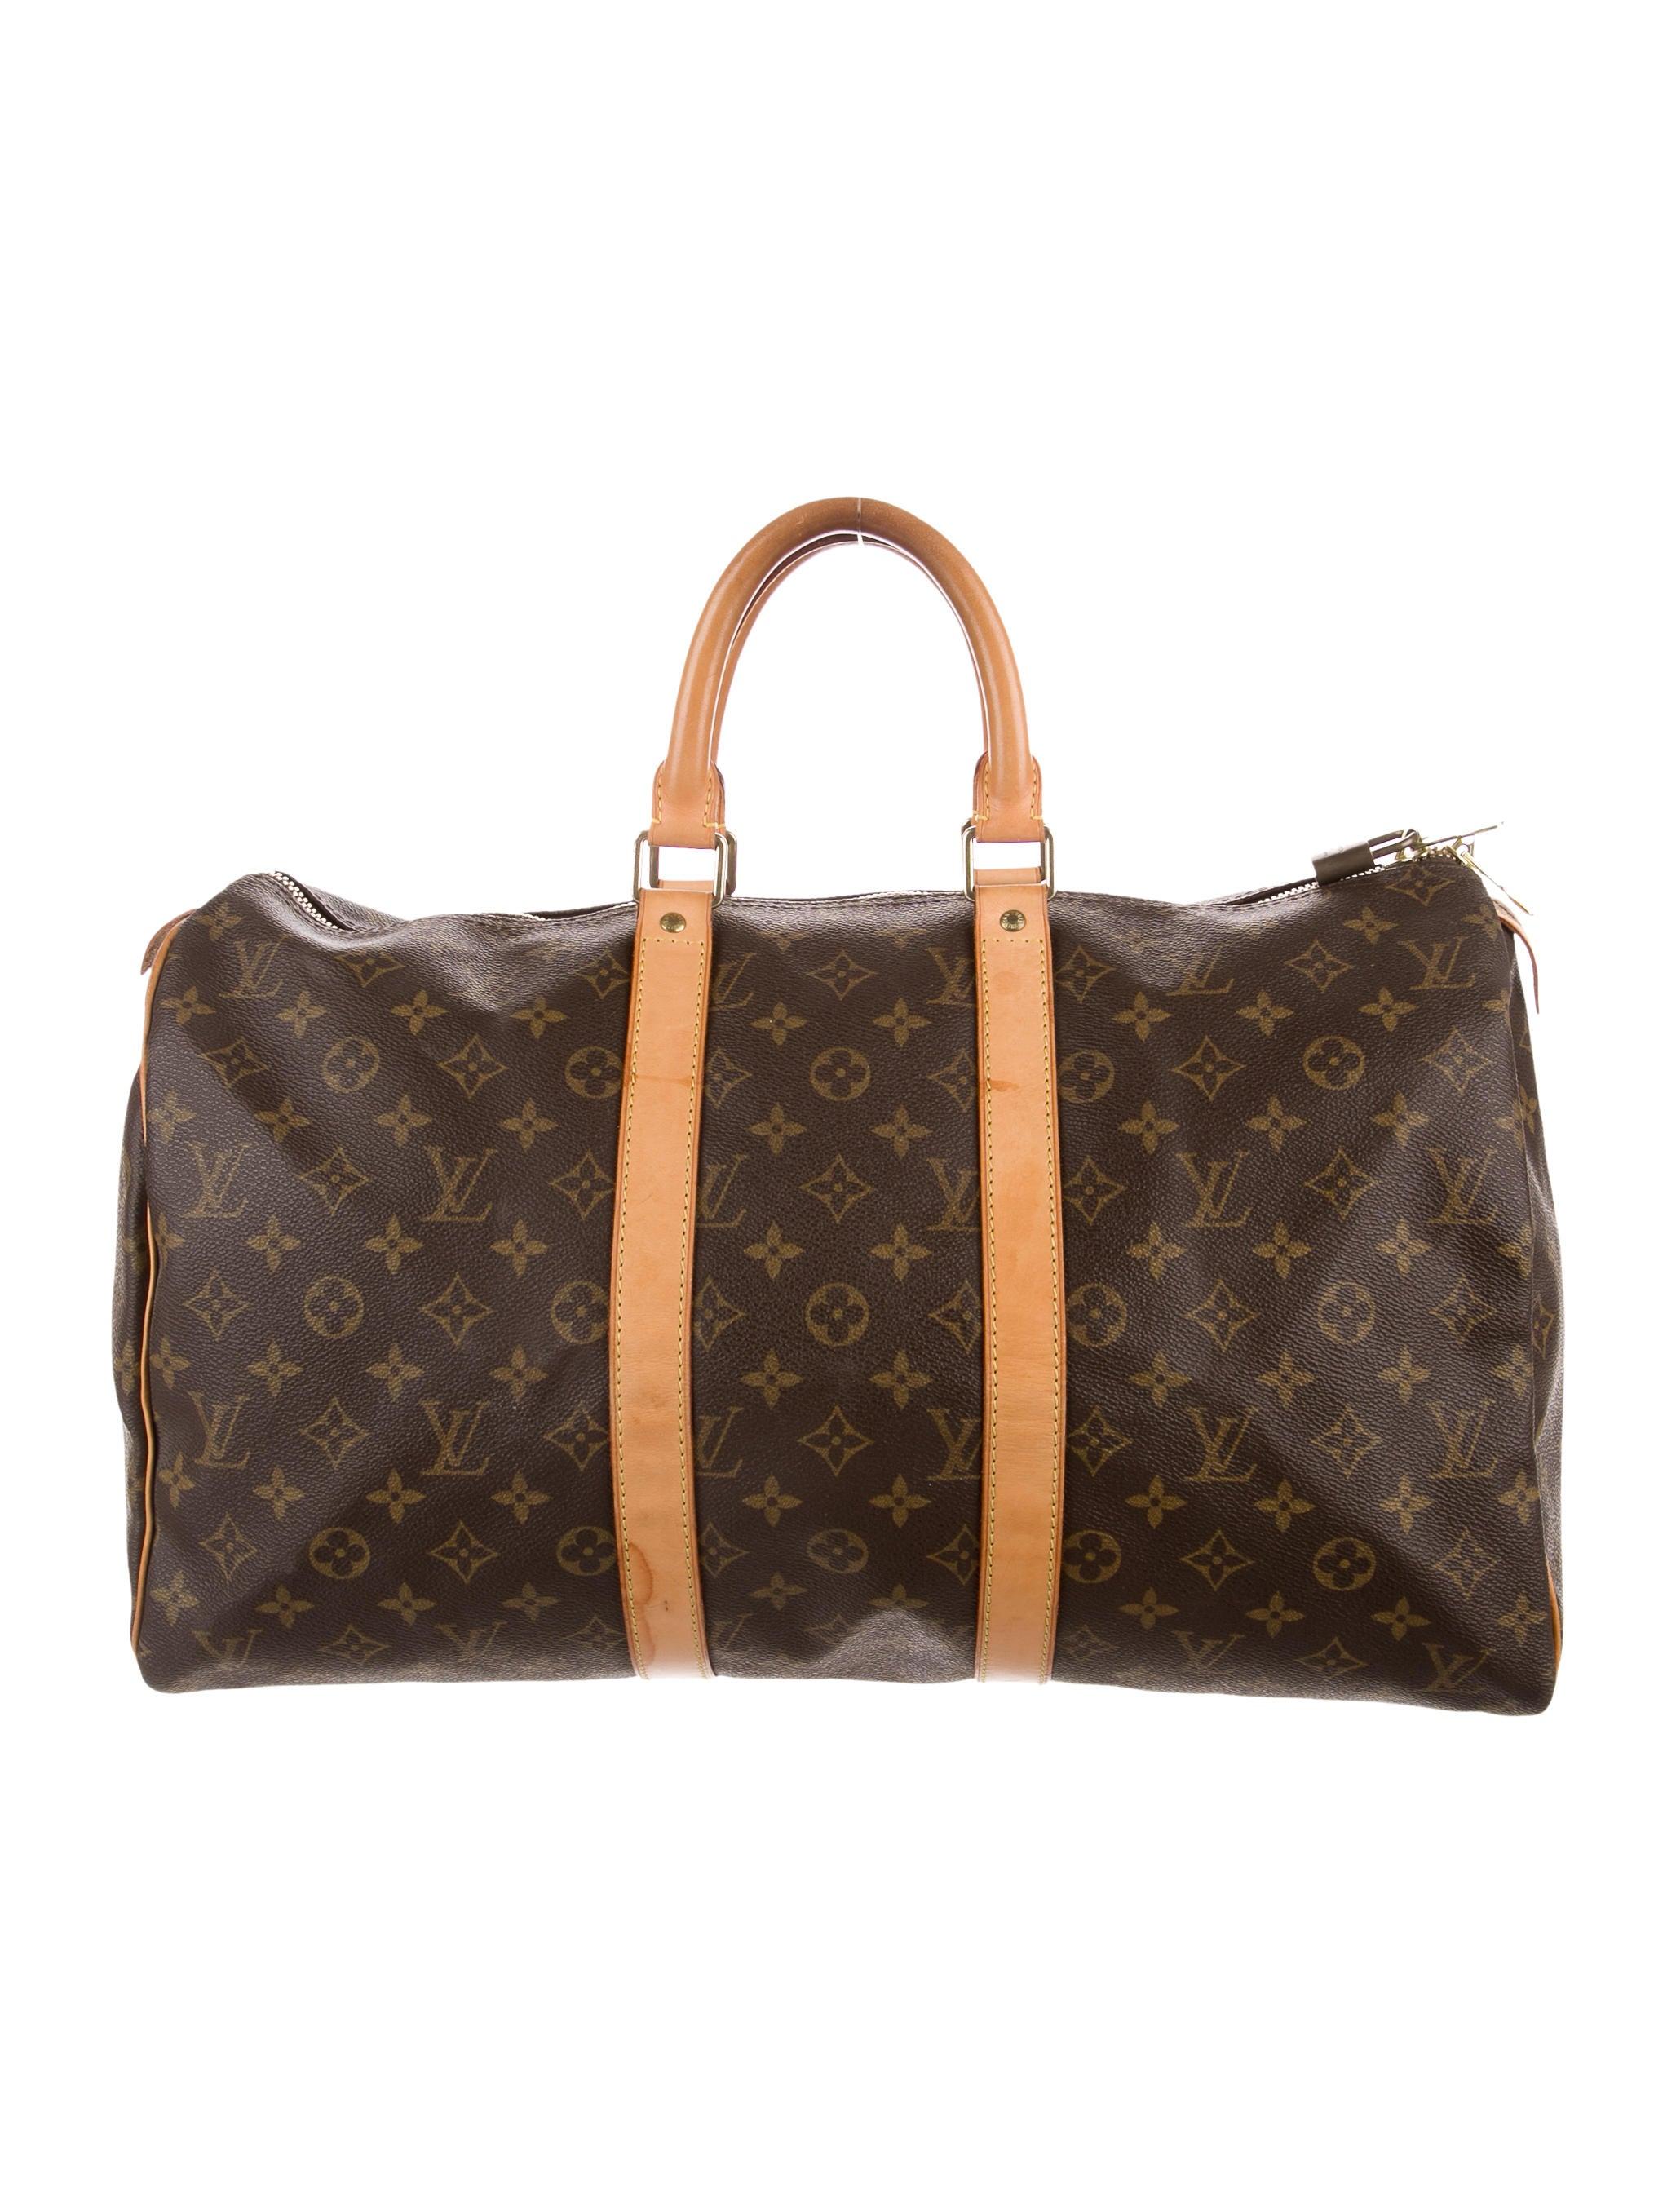 louis vuitton monogram keepall 45 handbags lou134020 the realreal. Black Bedroom Furniture Sets. Home Design Ideas